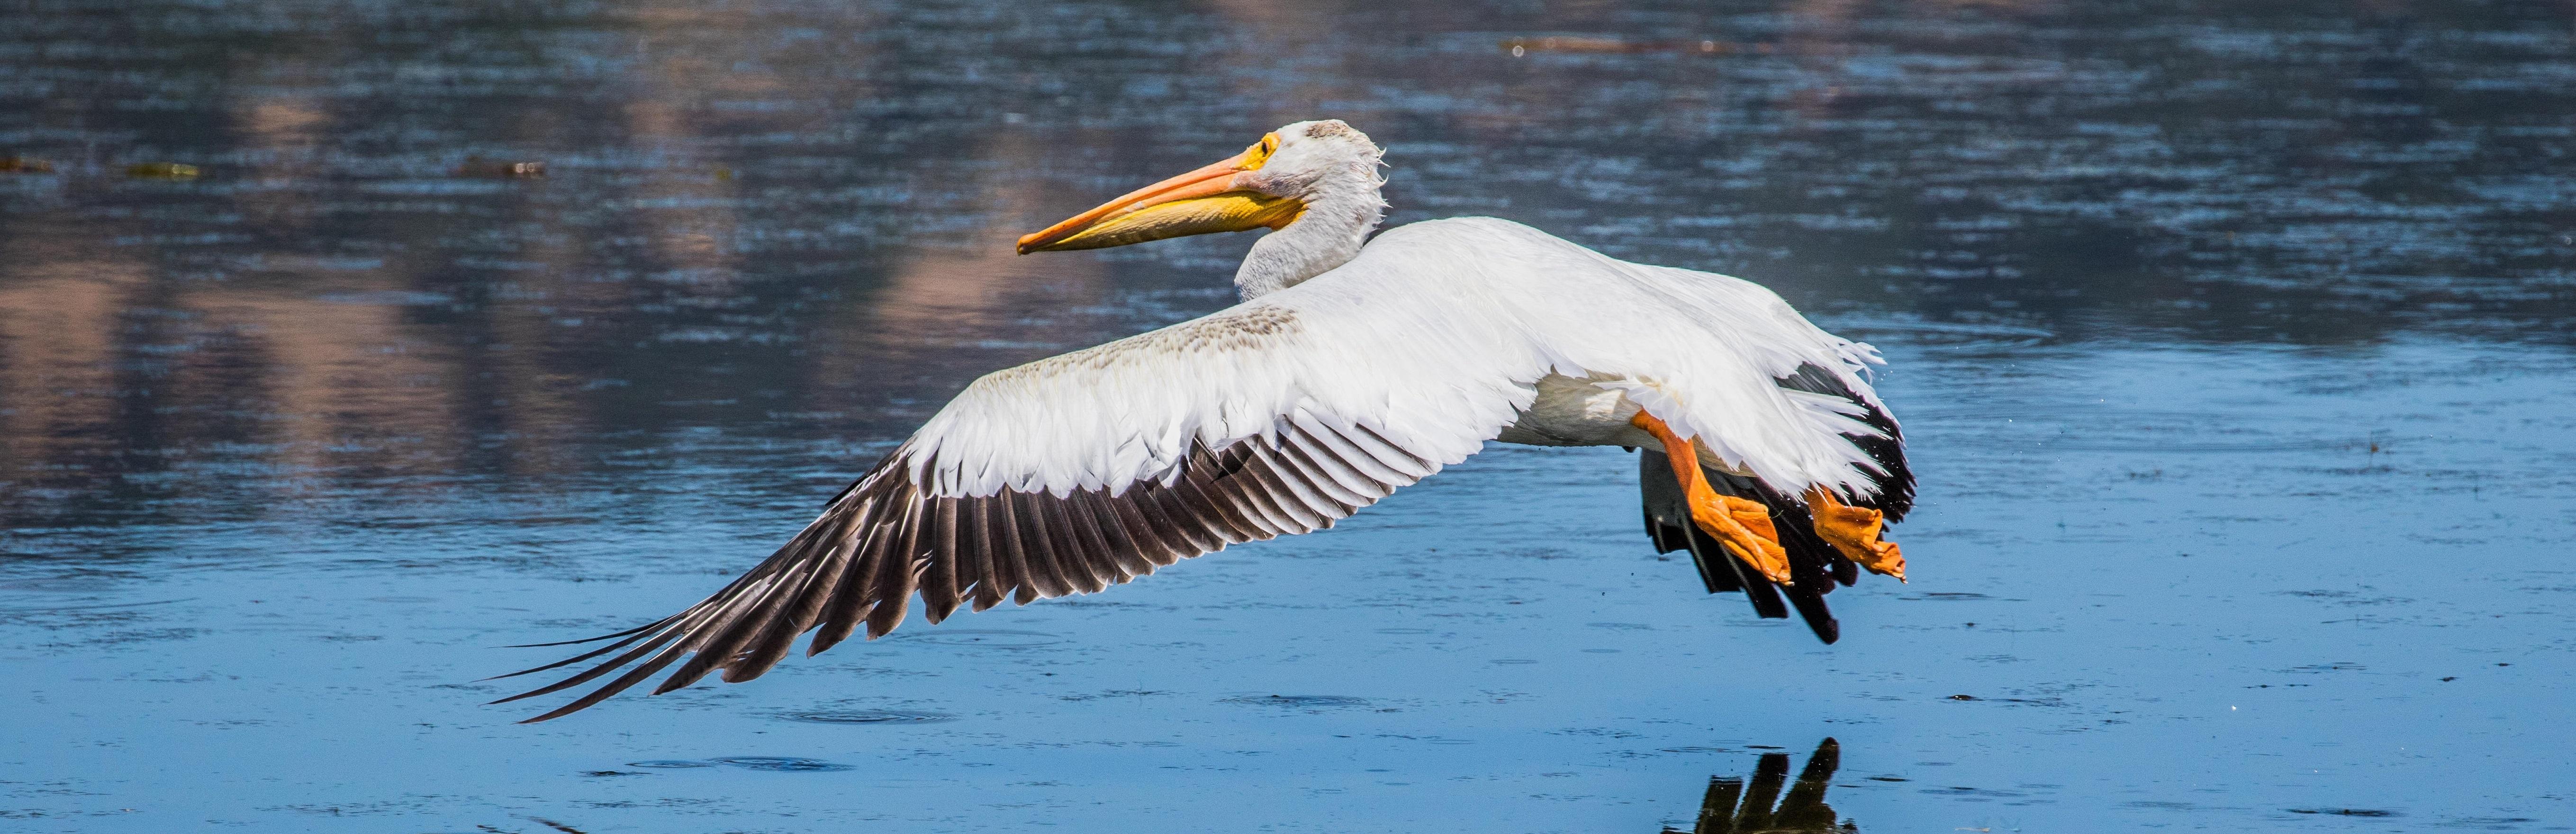 American-Pelican-Marin_BannerThin